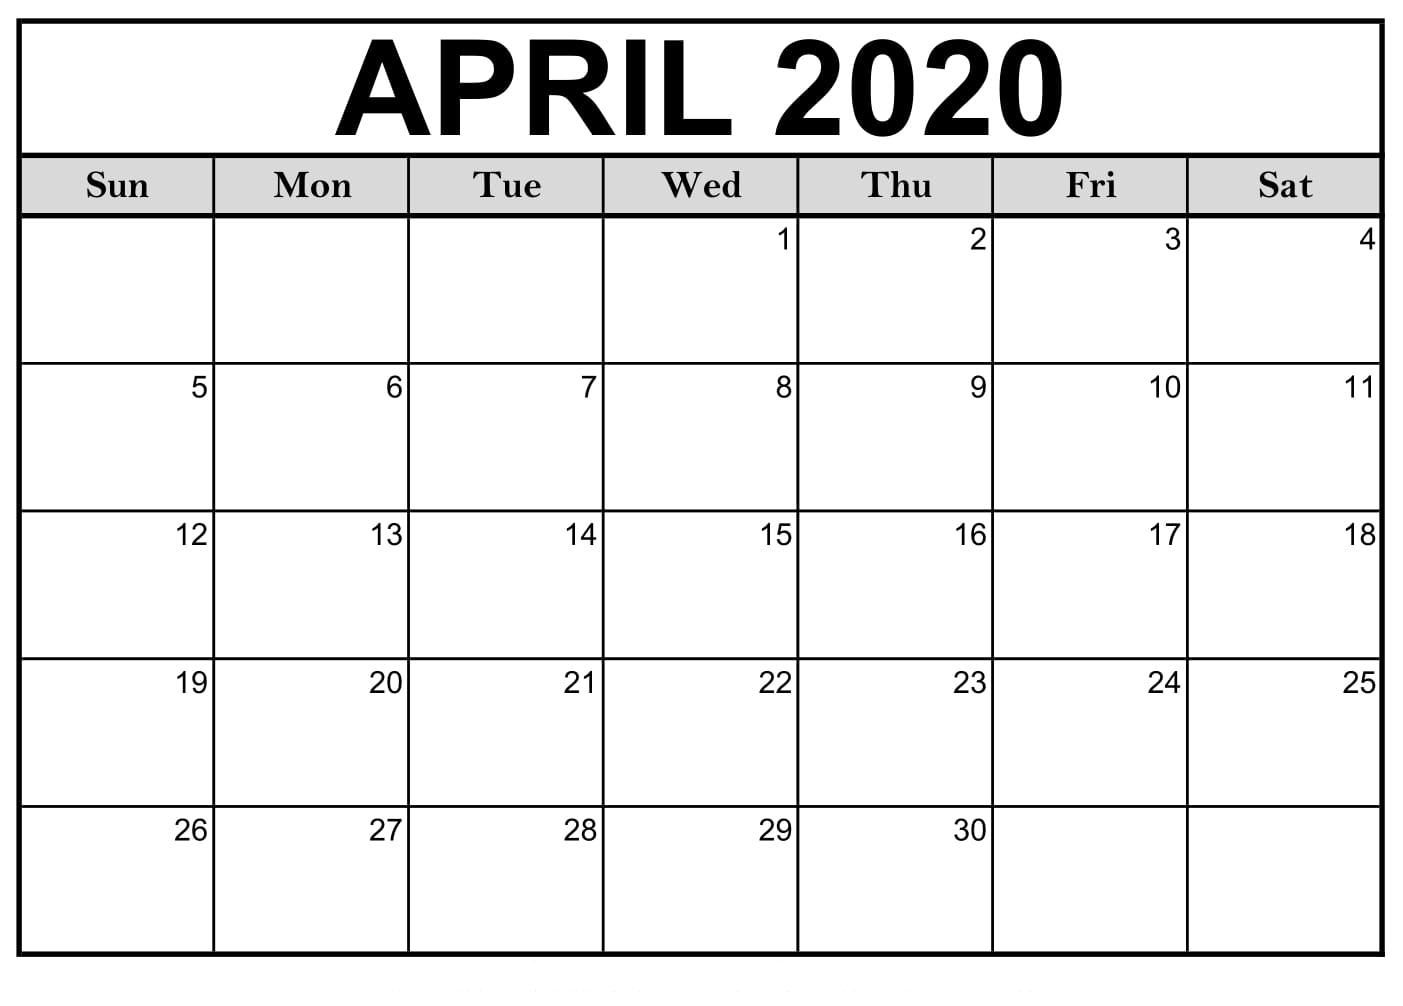 April 2020 Calendar Printable Monthly Calendar - Idea Hunt